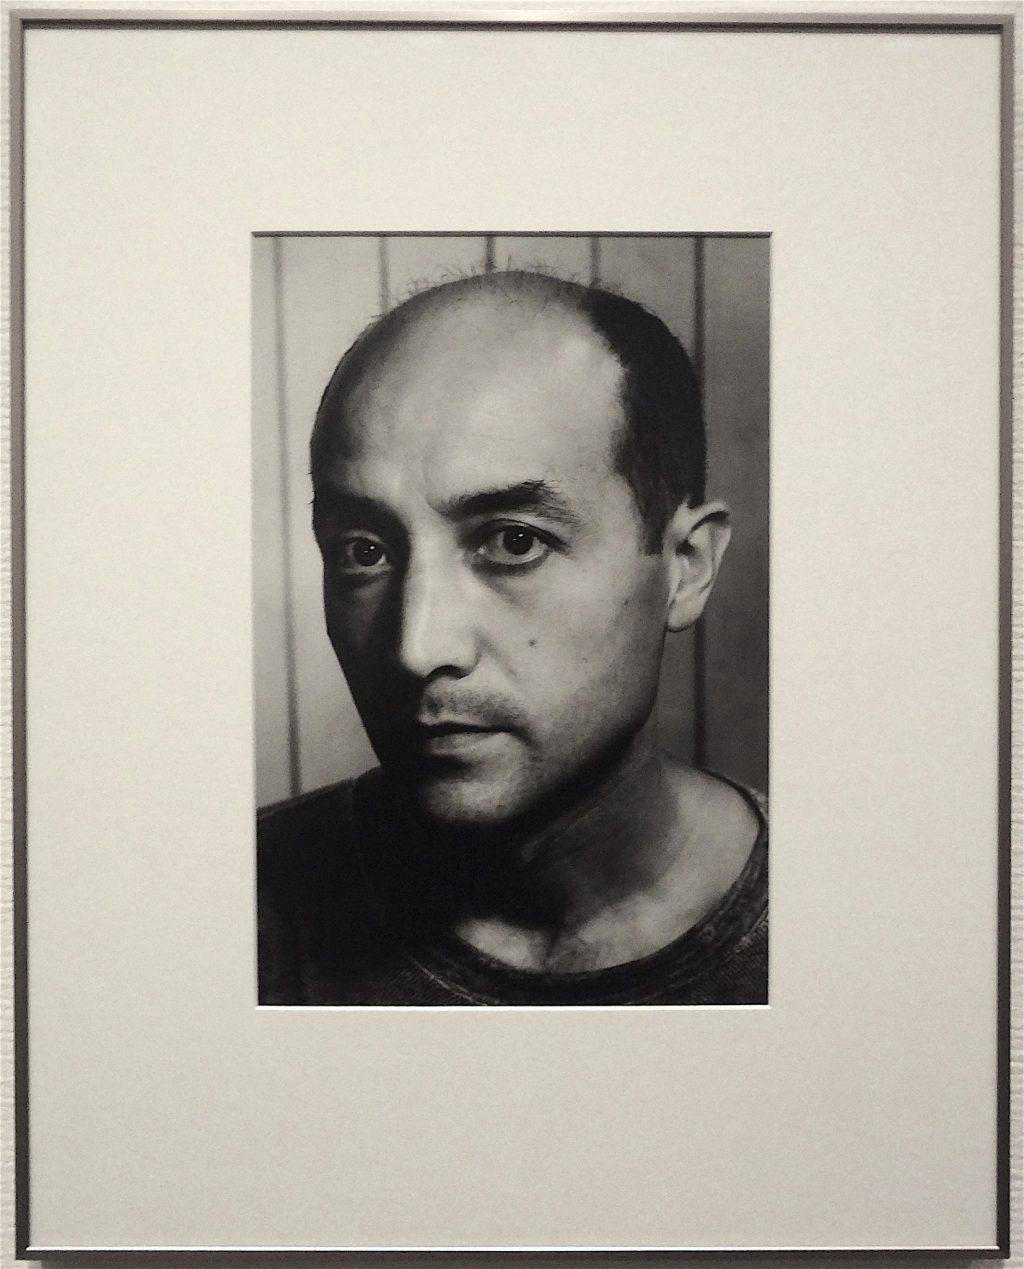 土門拳 DOMON Ken 「Isamu NOGUCHI」ca. 1950 @ 横浜美術館 Yokohama Museum 2012年